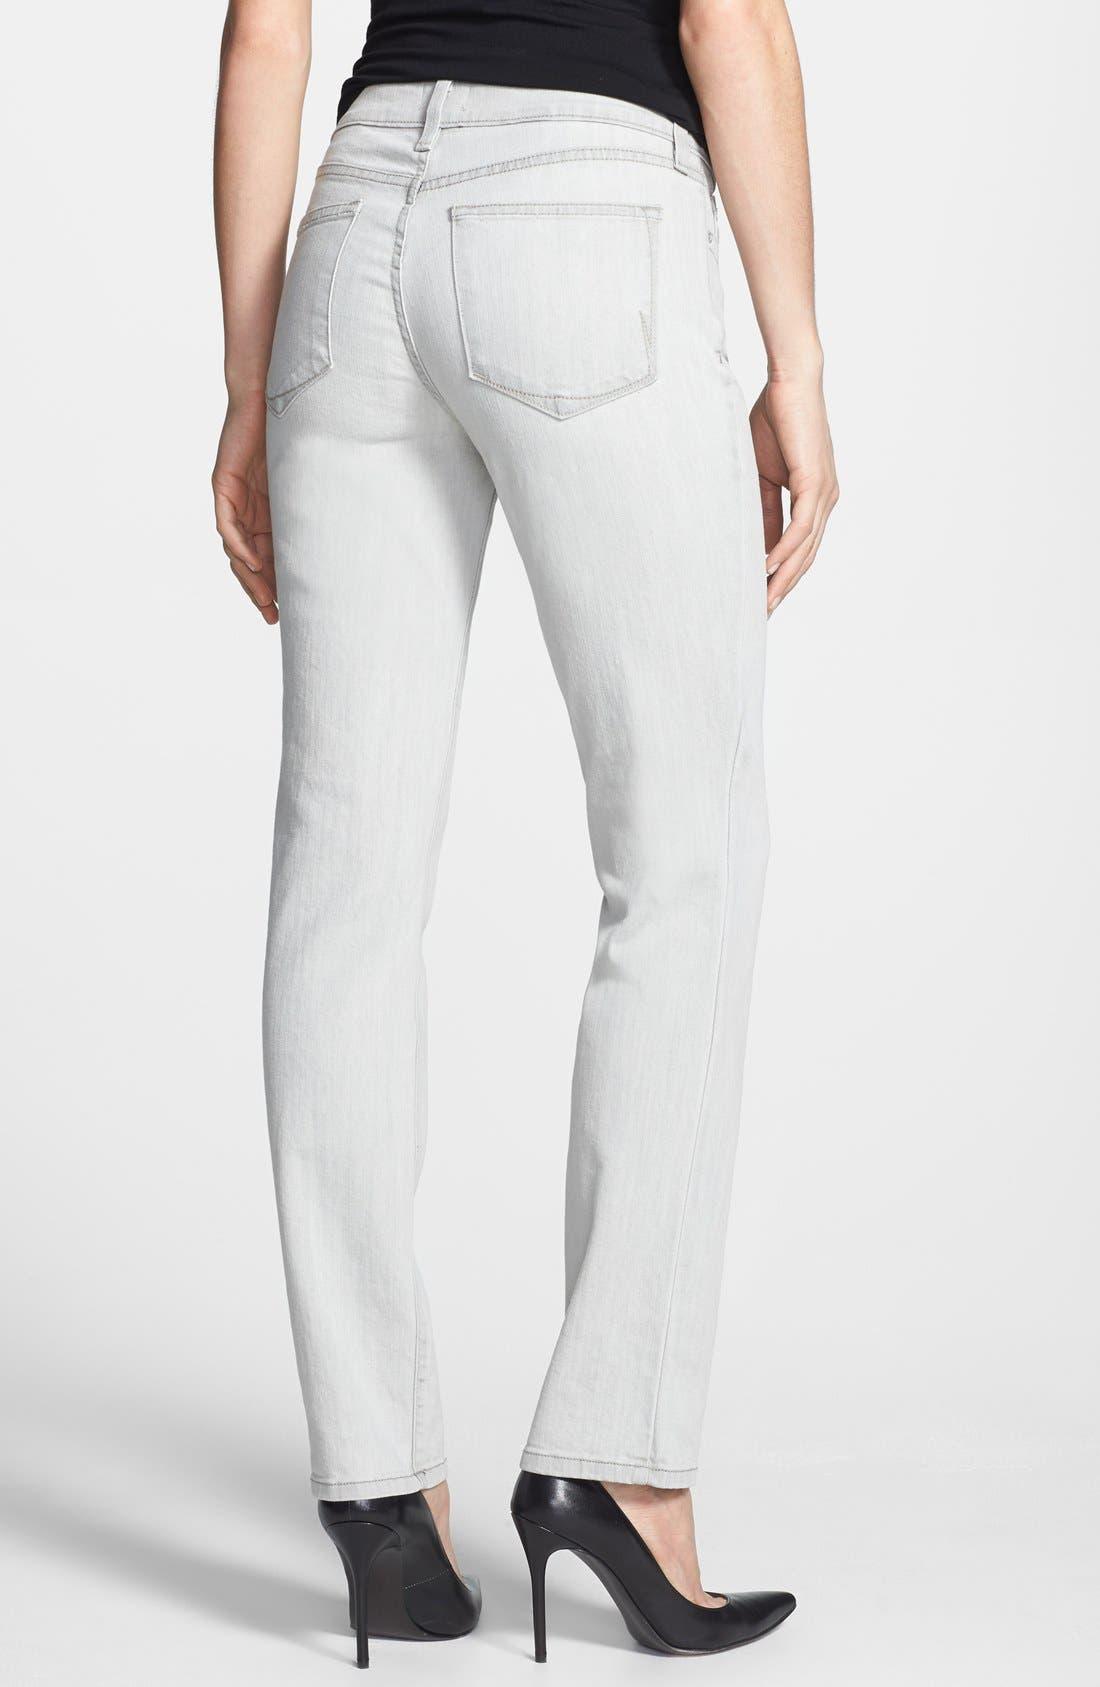 Alternate Image 2  - NYDJ 'Clarissa' Fitted Stretch Ankle Skinny Jeans (Salt Spring)